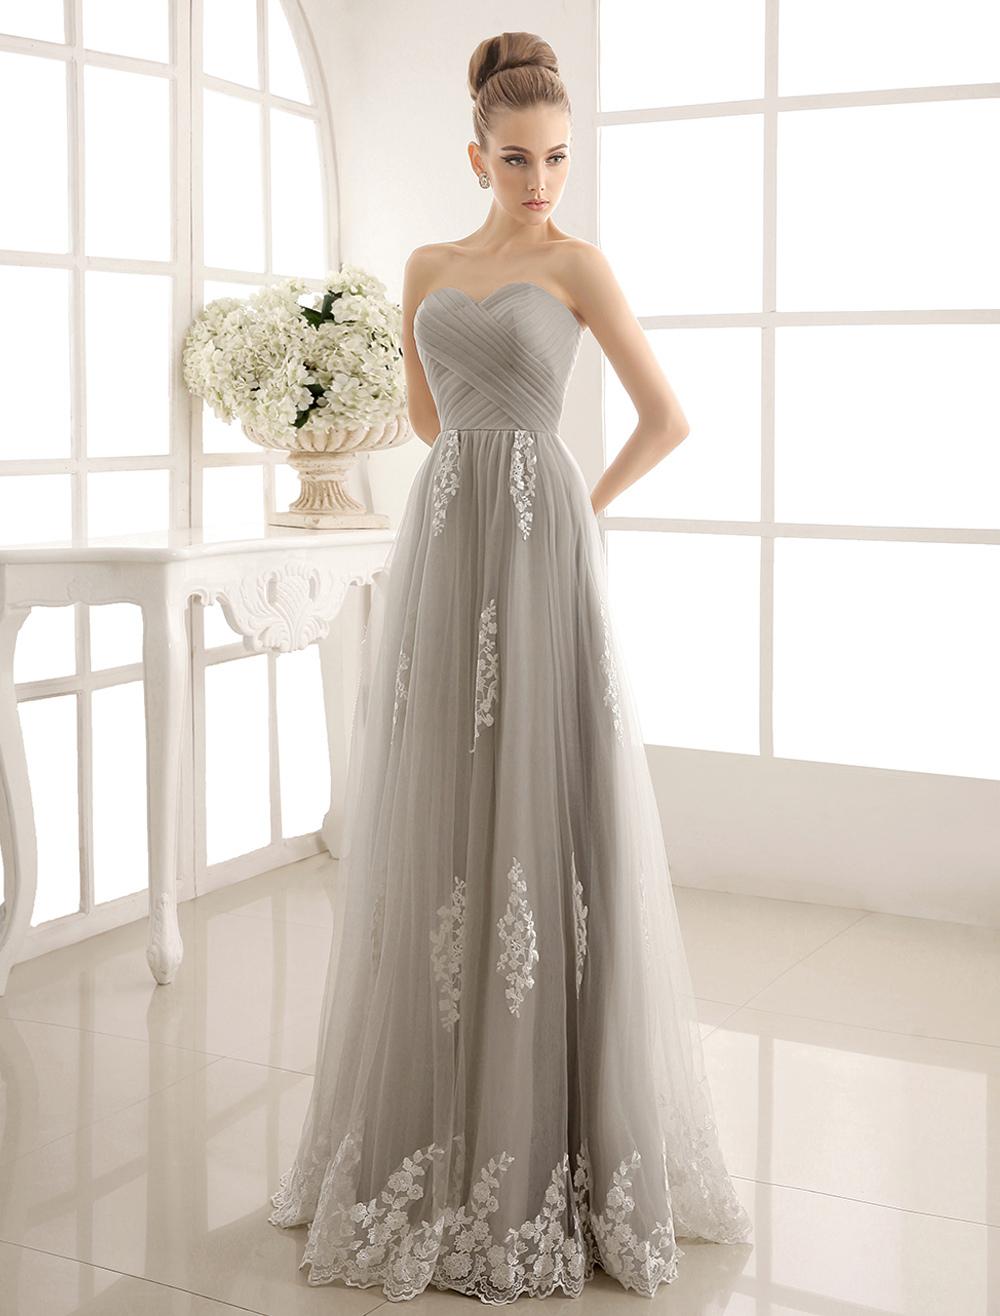 Gray Lace Ruffles Strapless Satin Tulle Wedding Dress